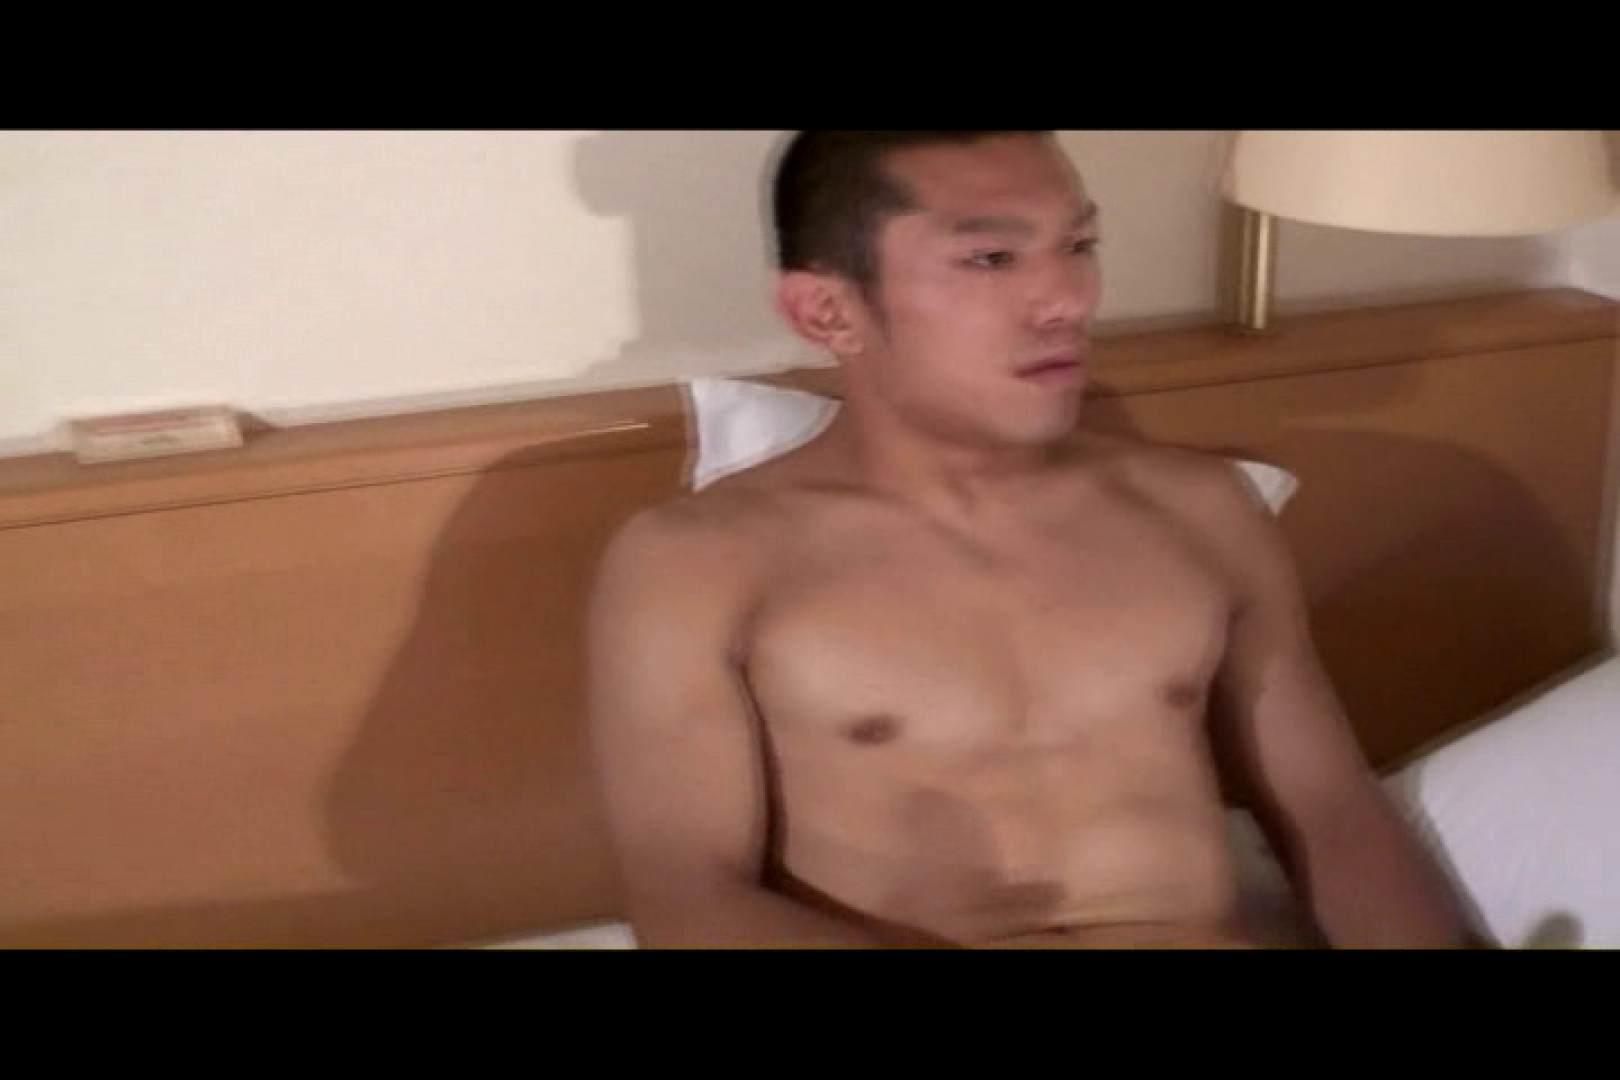 Bistro「イケメン」~Mokkori和風仕立て~vol.04 イケメン  82pic 45